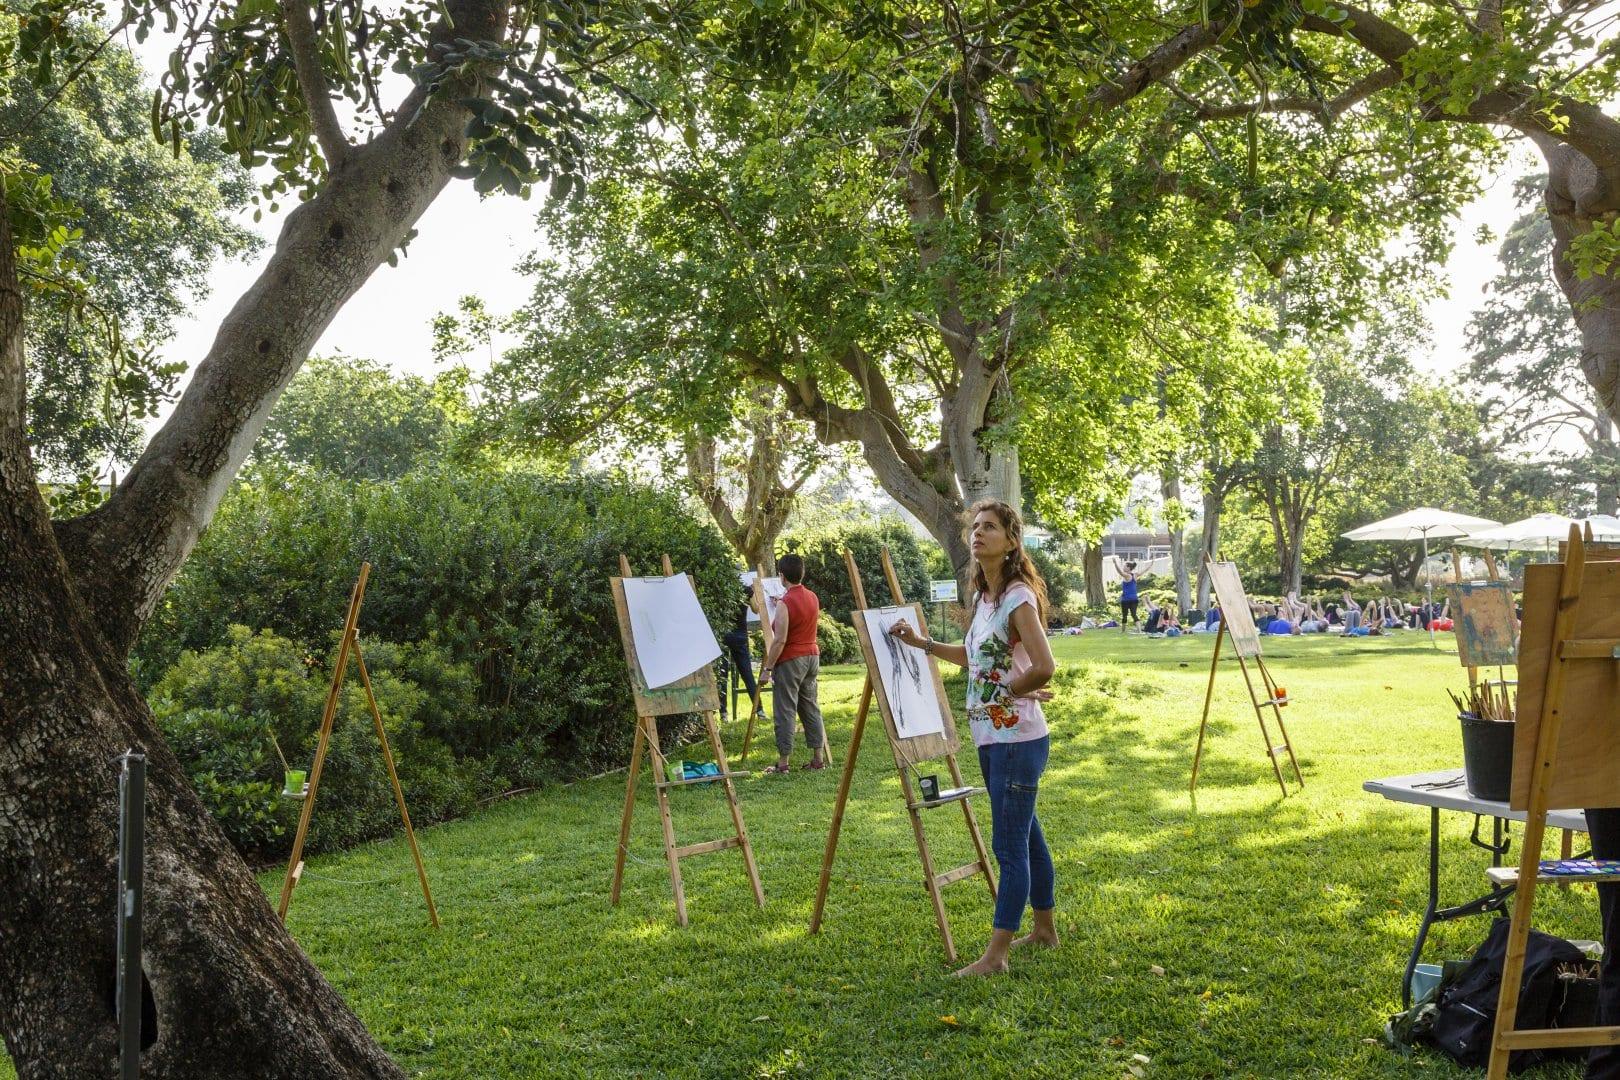 Ramat Hanadiv Gardens, May 2018, Zichron Yaacov, Israel.